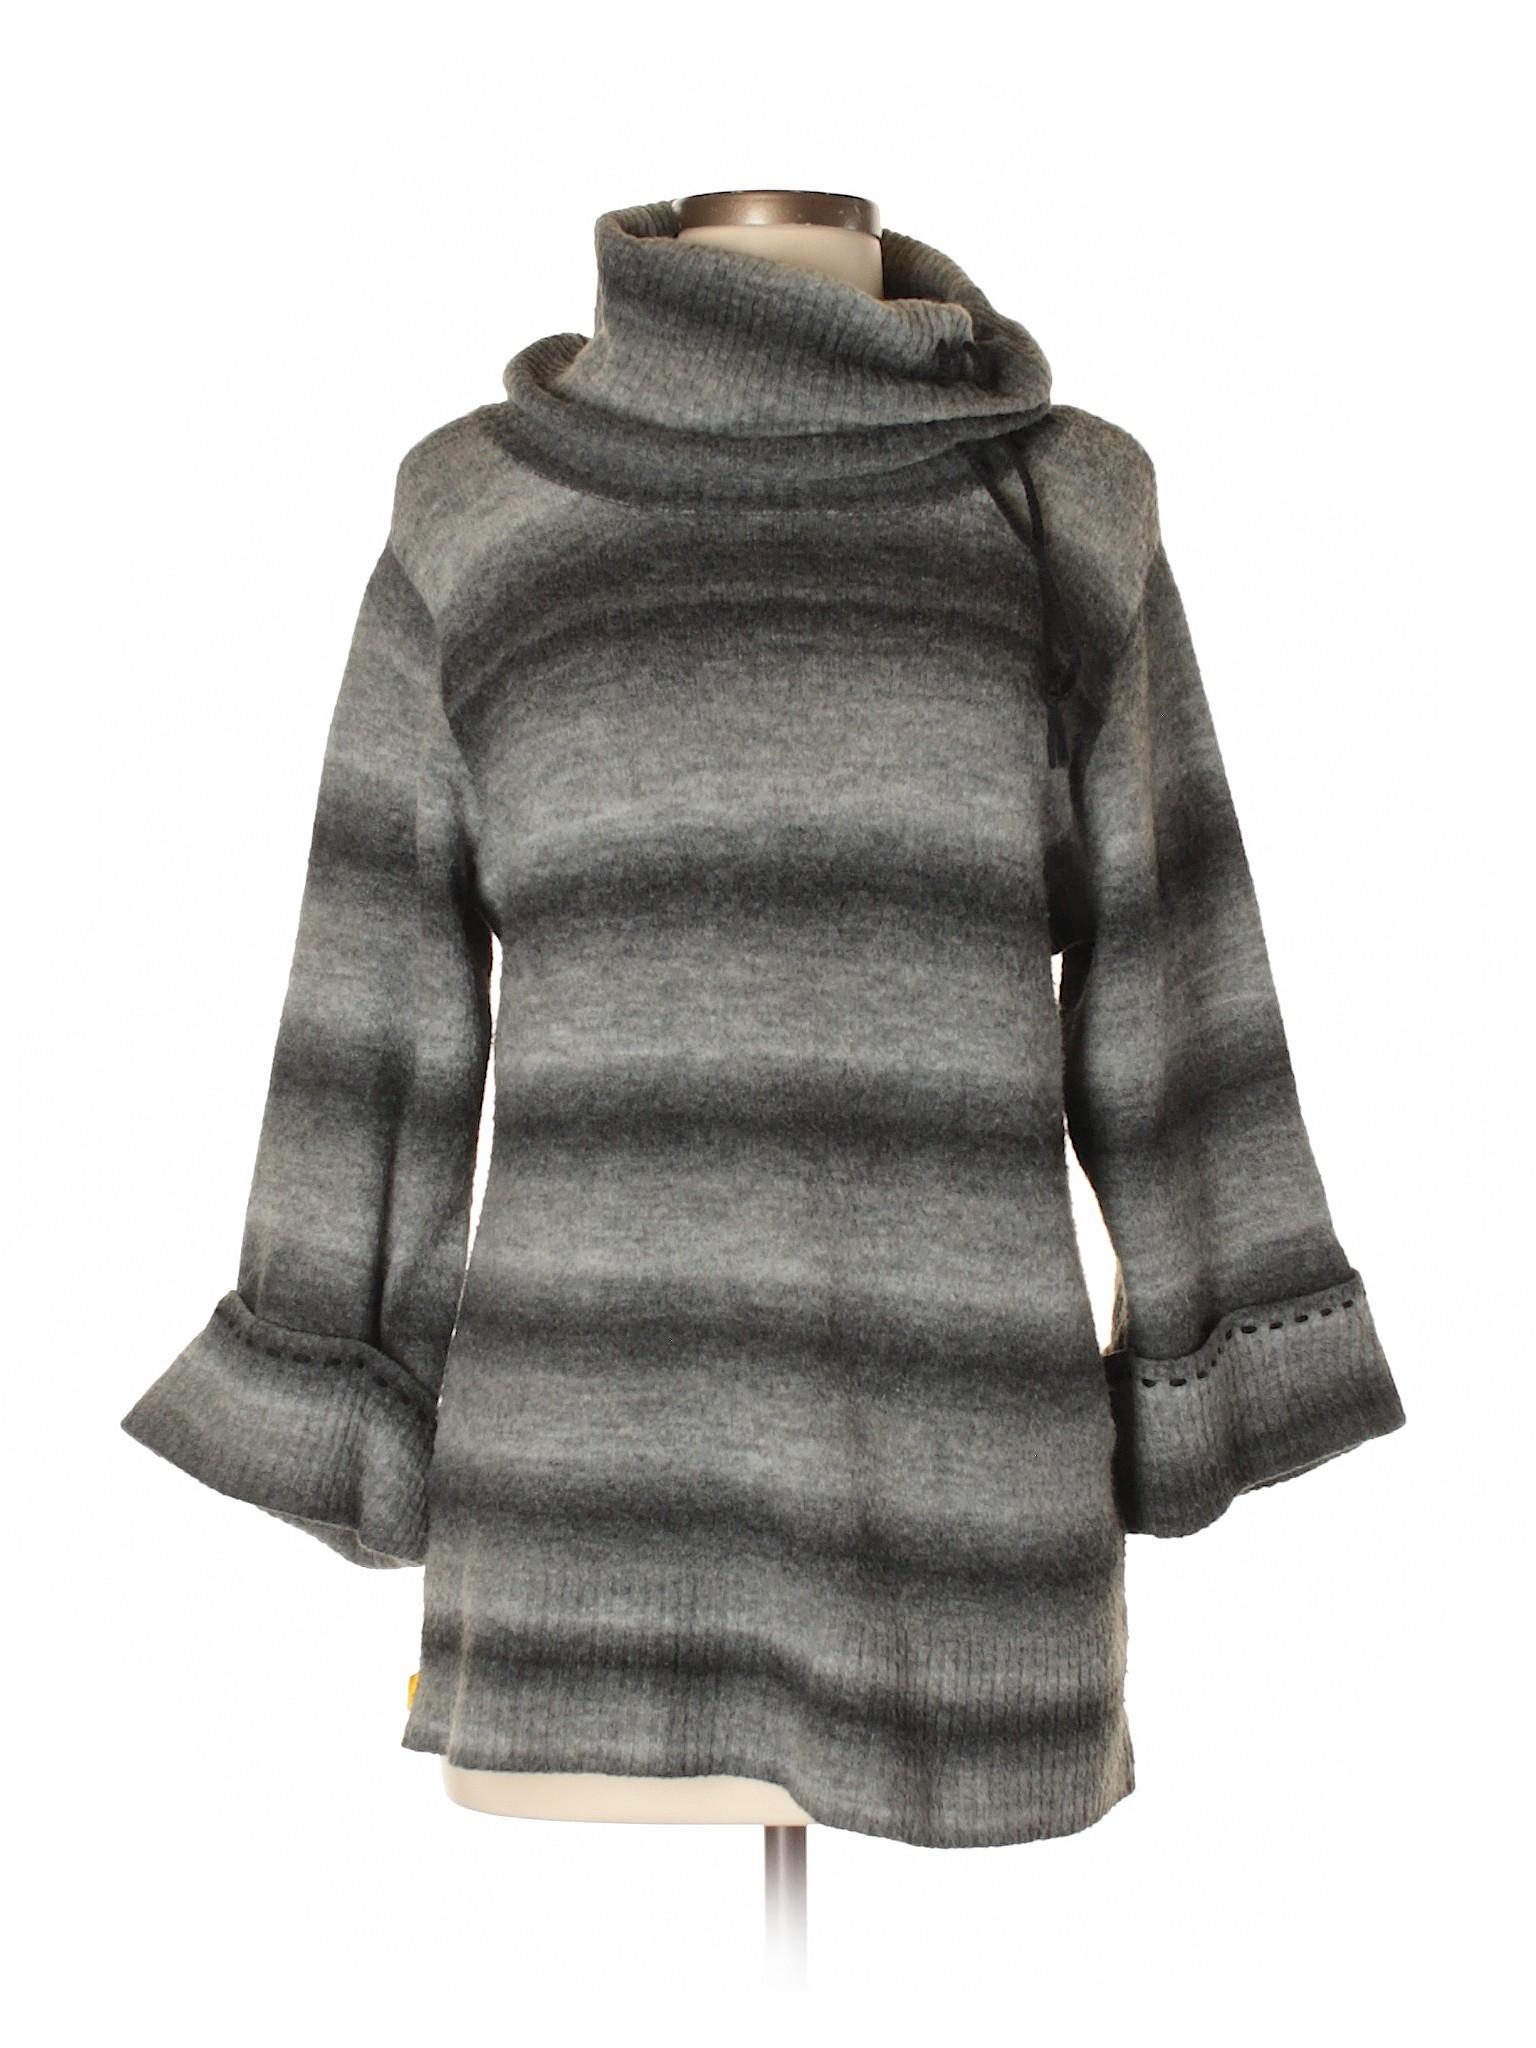 Pullover Pullover Lole Sweater Lole Lole Pullover Sweater Boutique Boutique winter Sweater winter winter Boutique winter Boutique xHwqSYfa